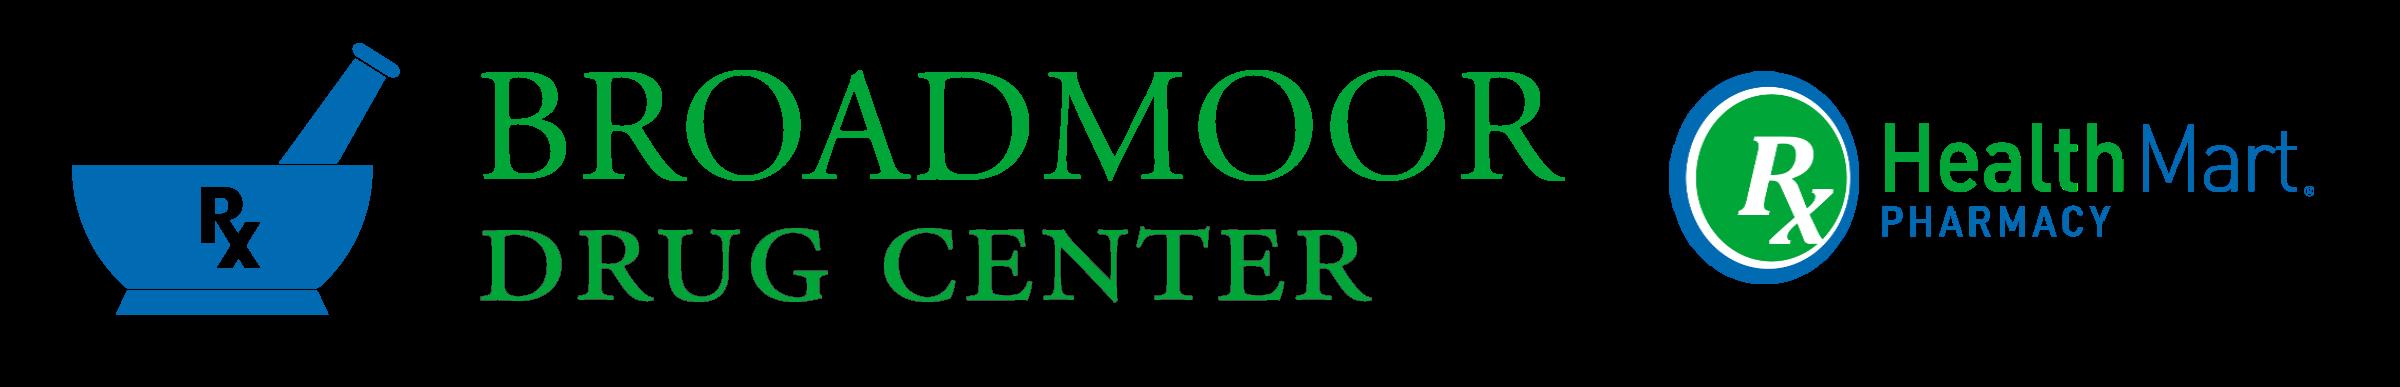 Broadmoor Drug Center